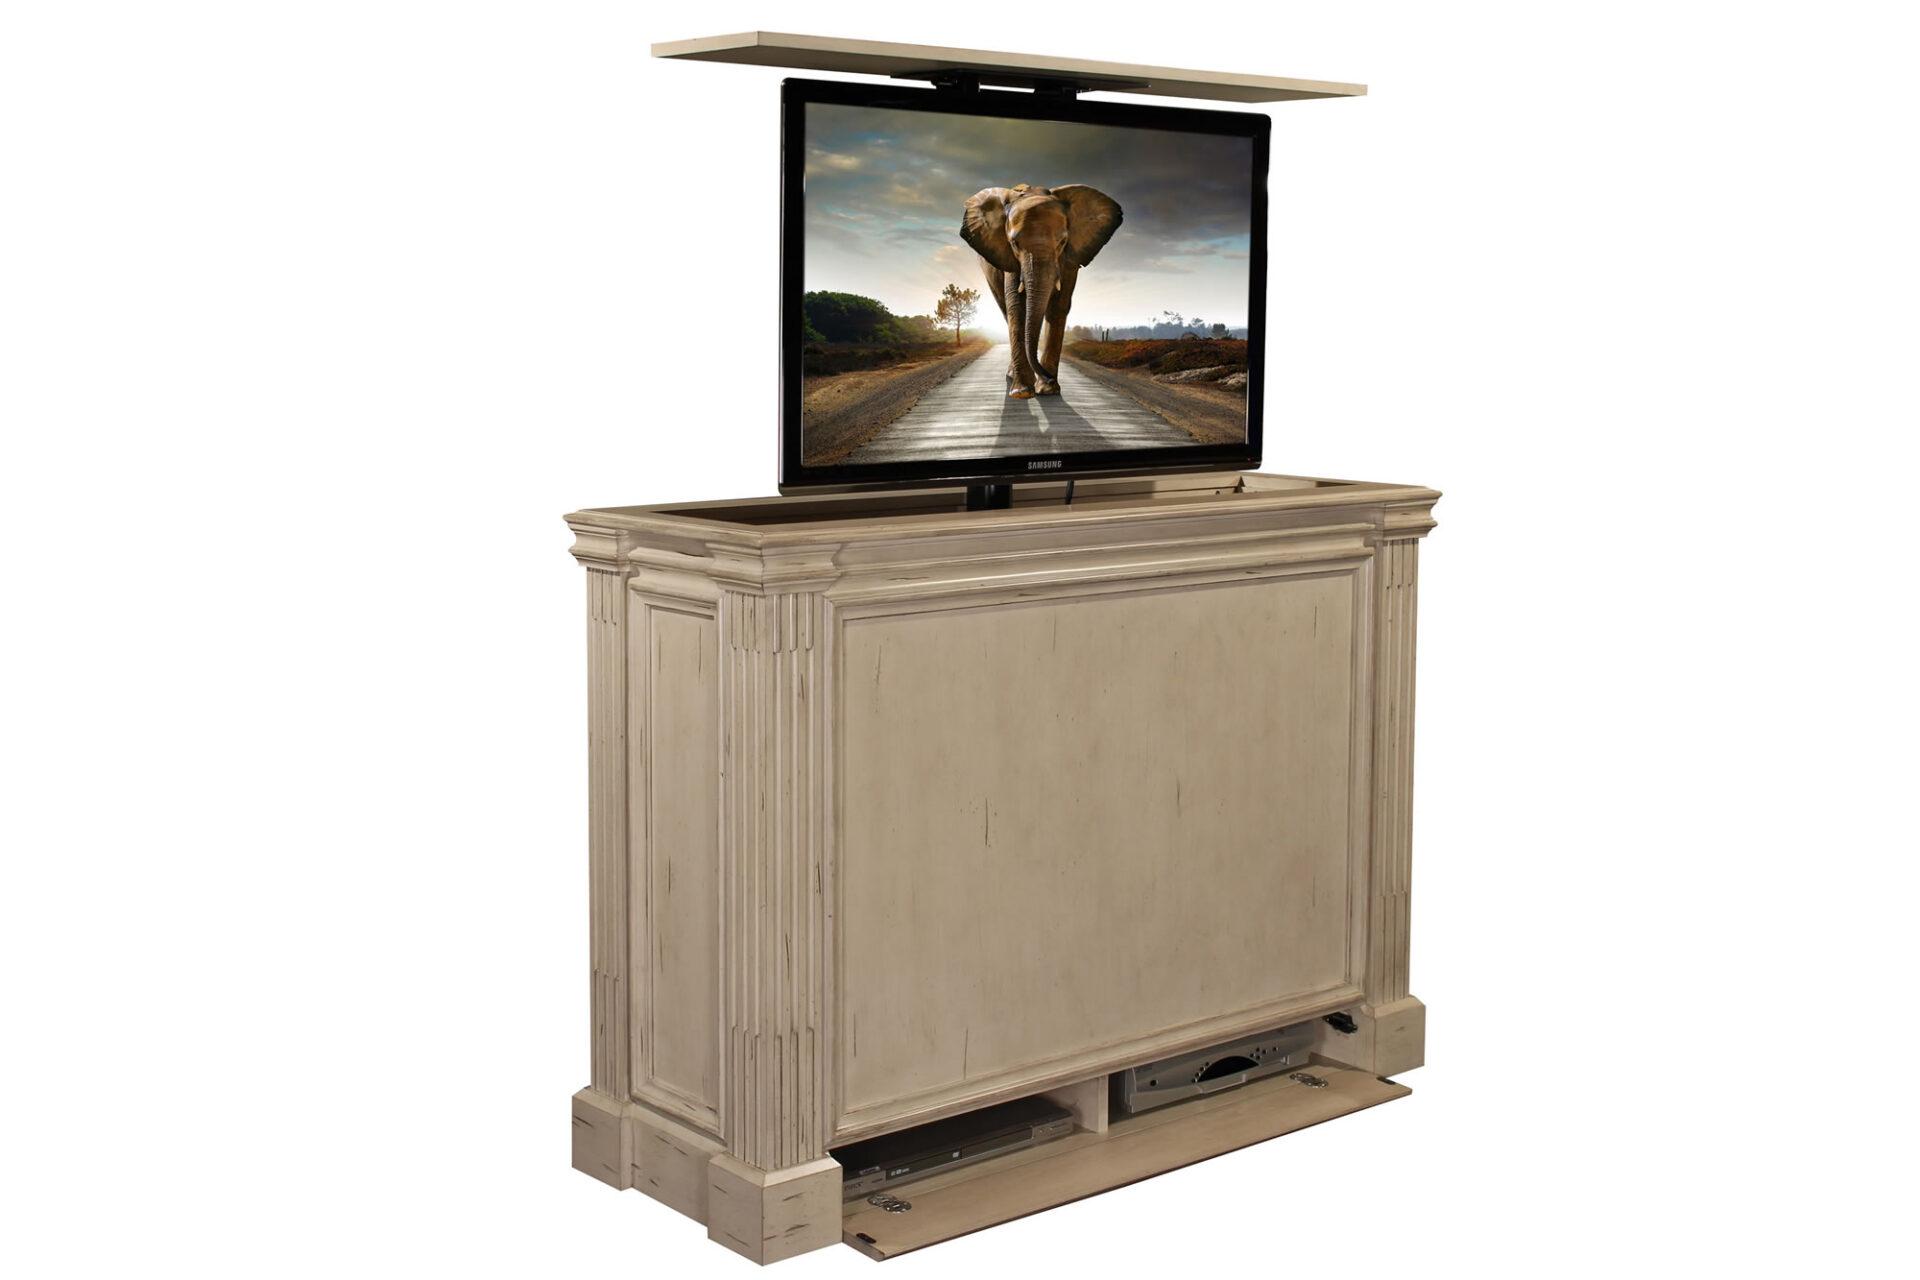 Awesome Ritz Camden White Tv Lift Cabinet Tv Lift Furniture Download Free Architecture Designs Sospemadebymaigaardcom